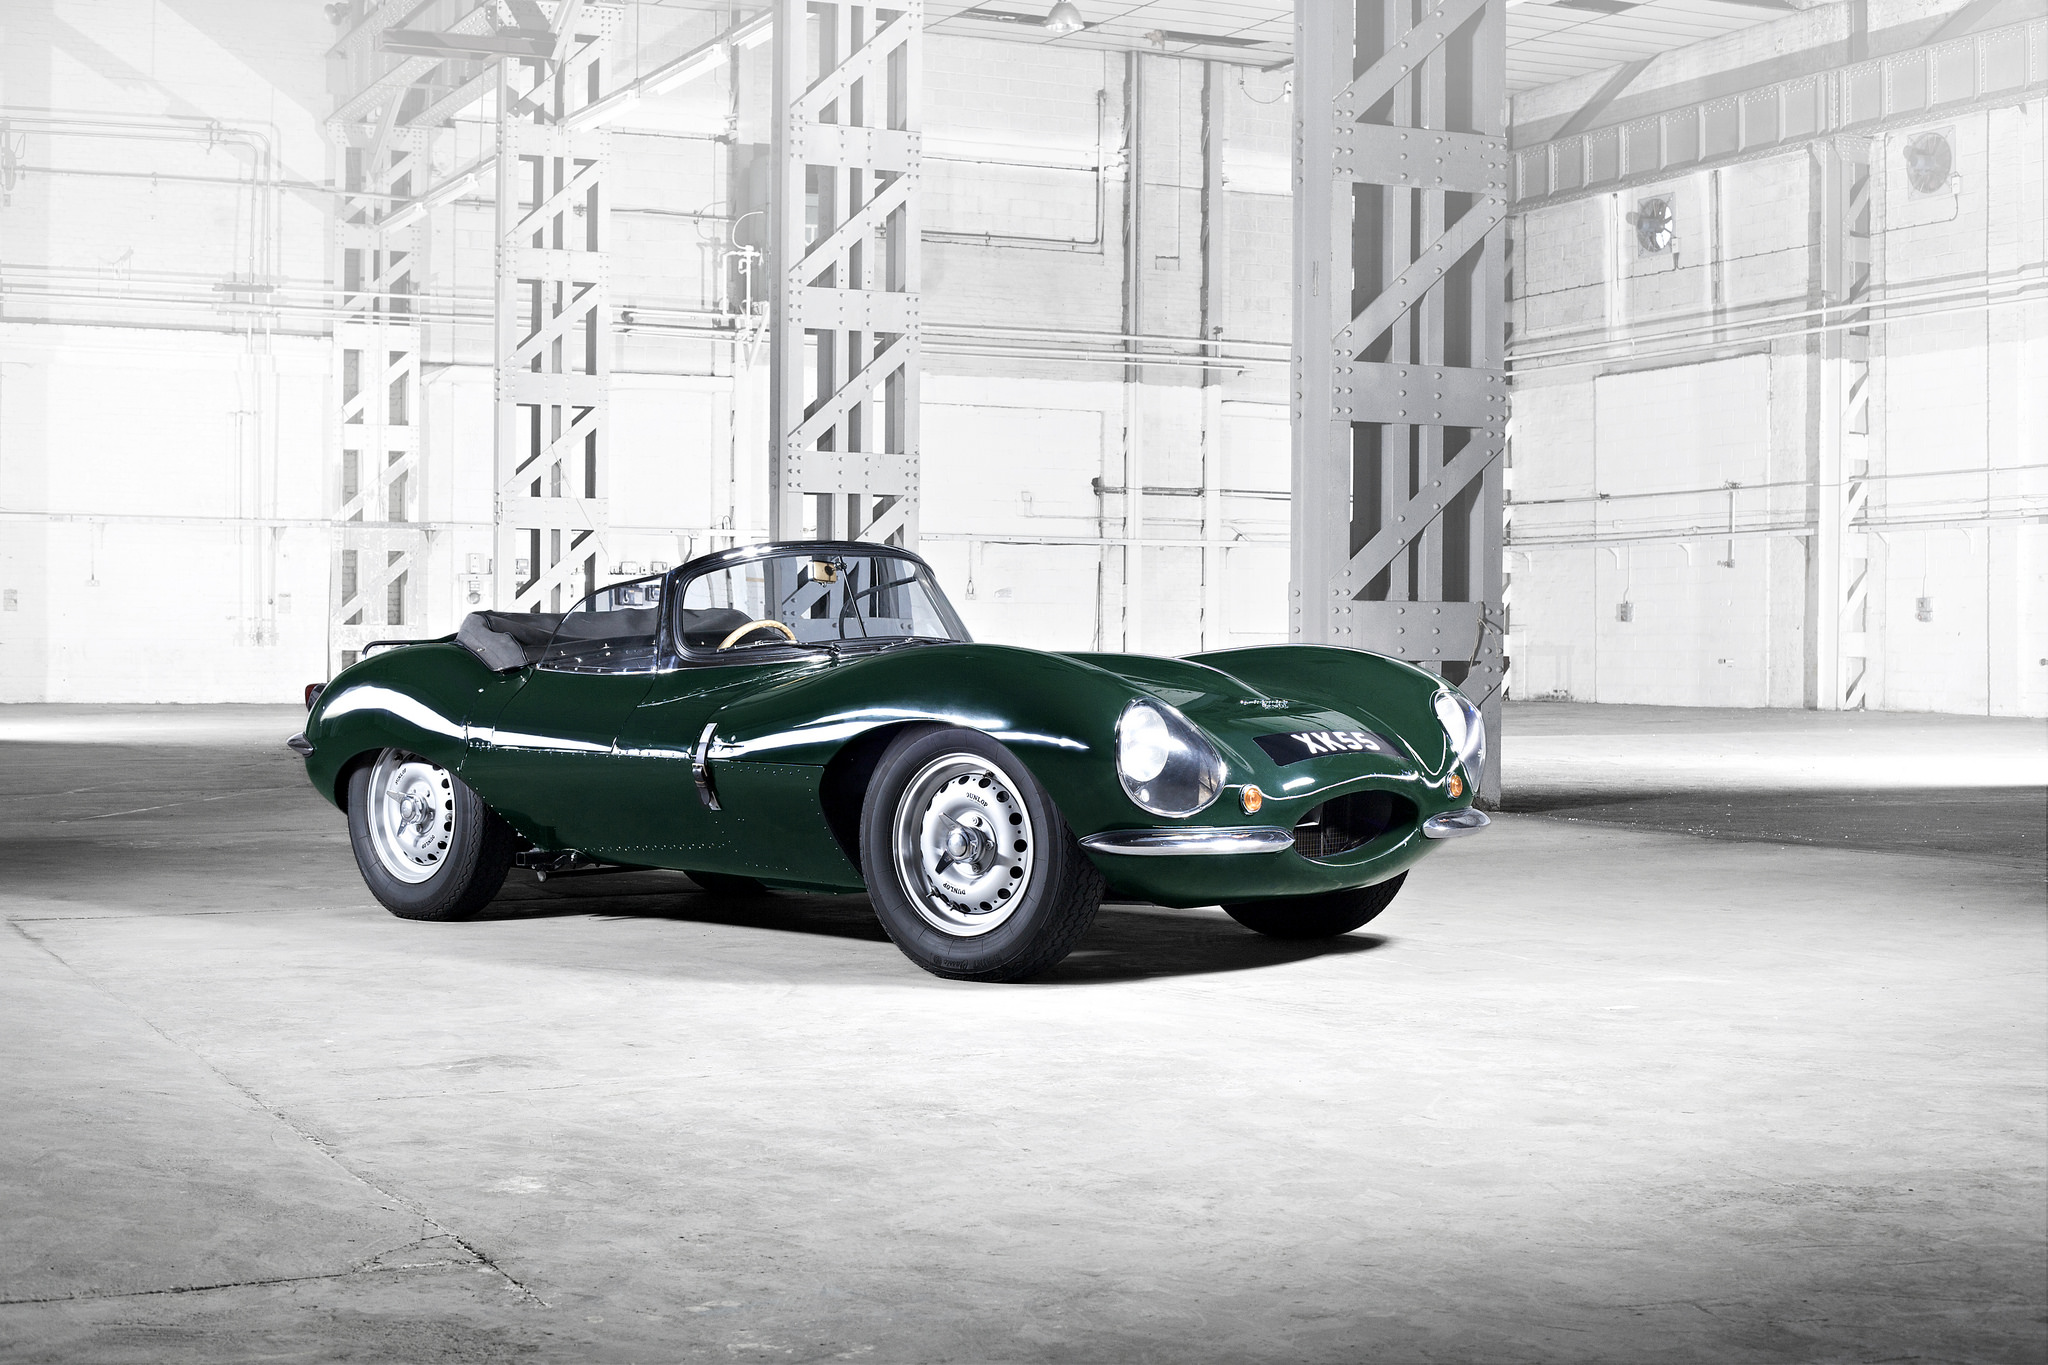 1957 Jaguar XKSS is among Best of the Dream Luxury Cars for Successful Entrepreneurs